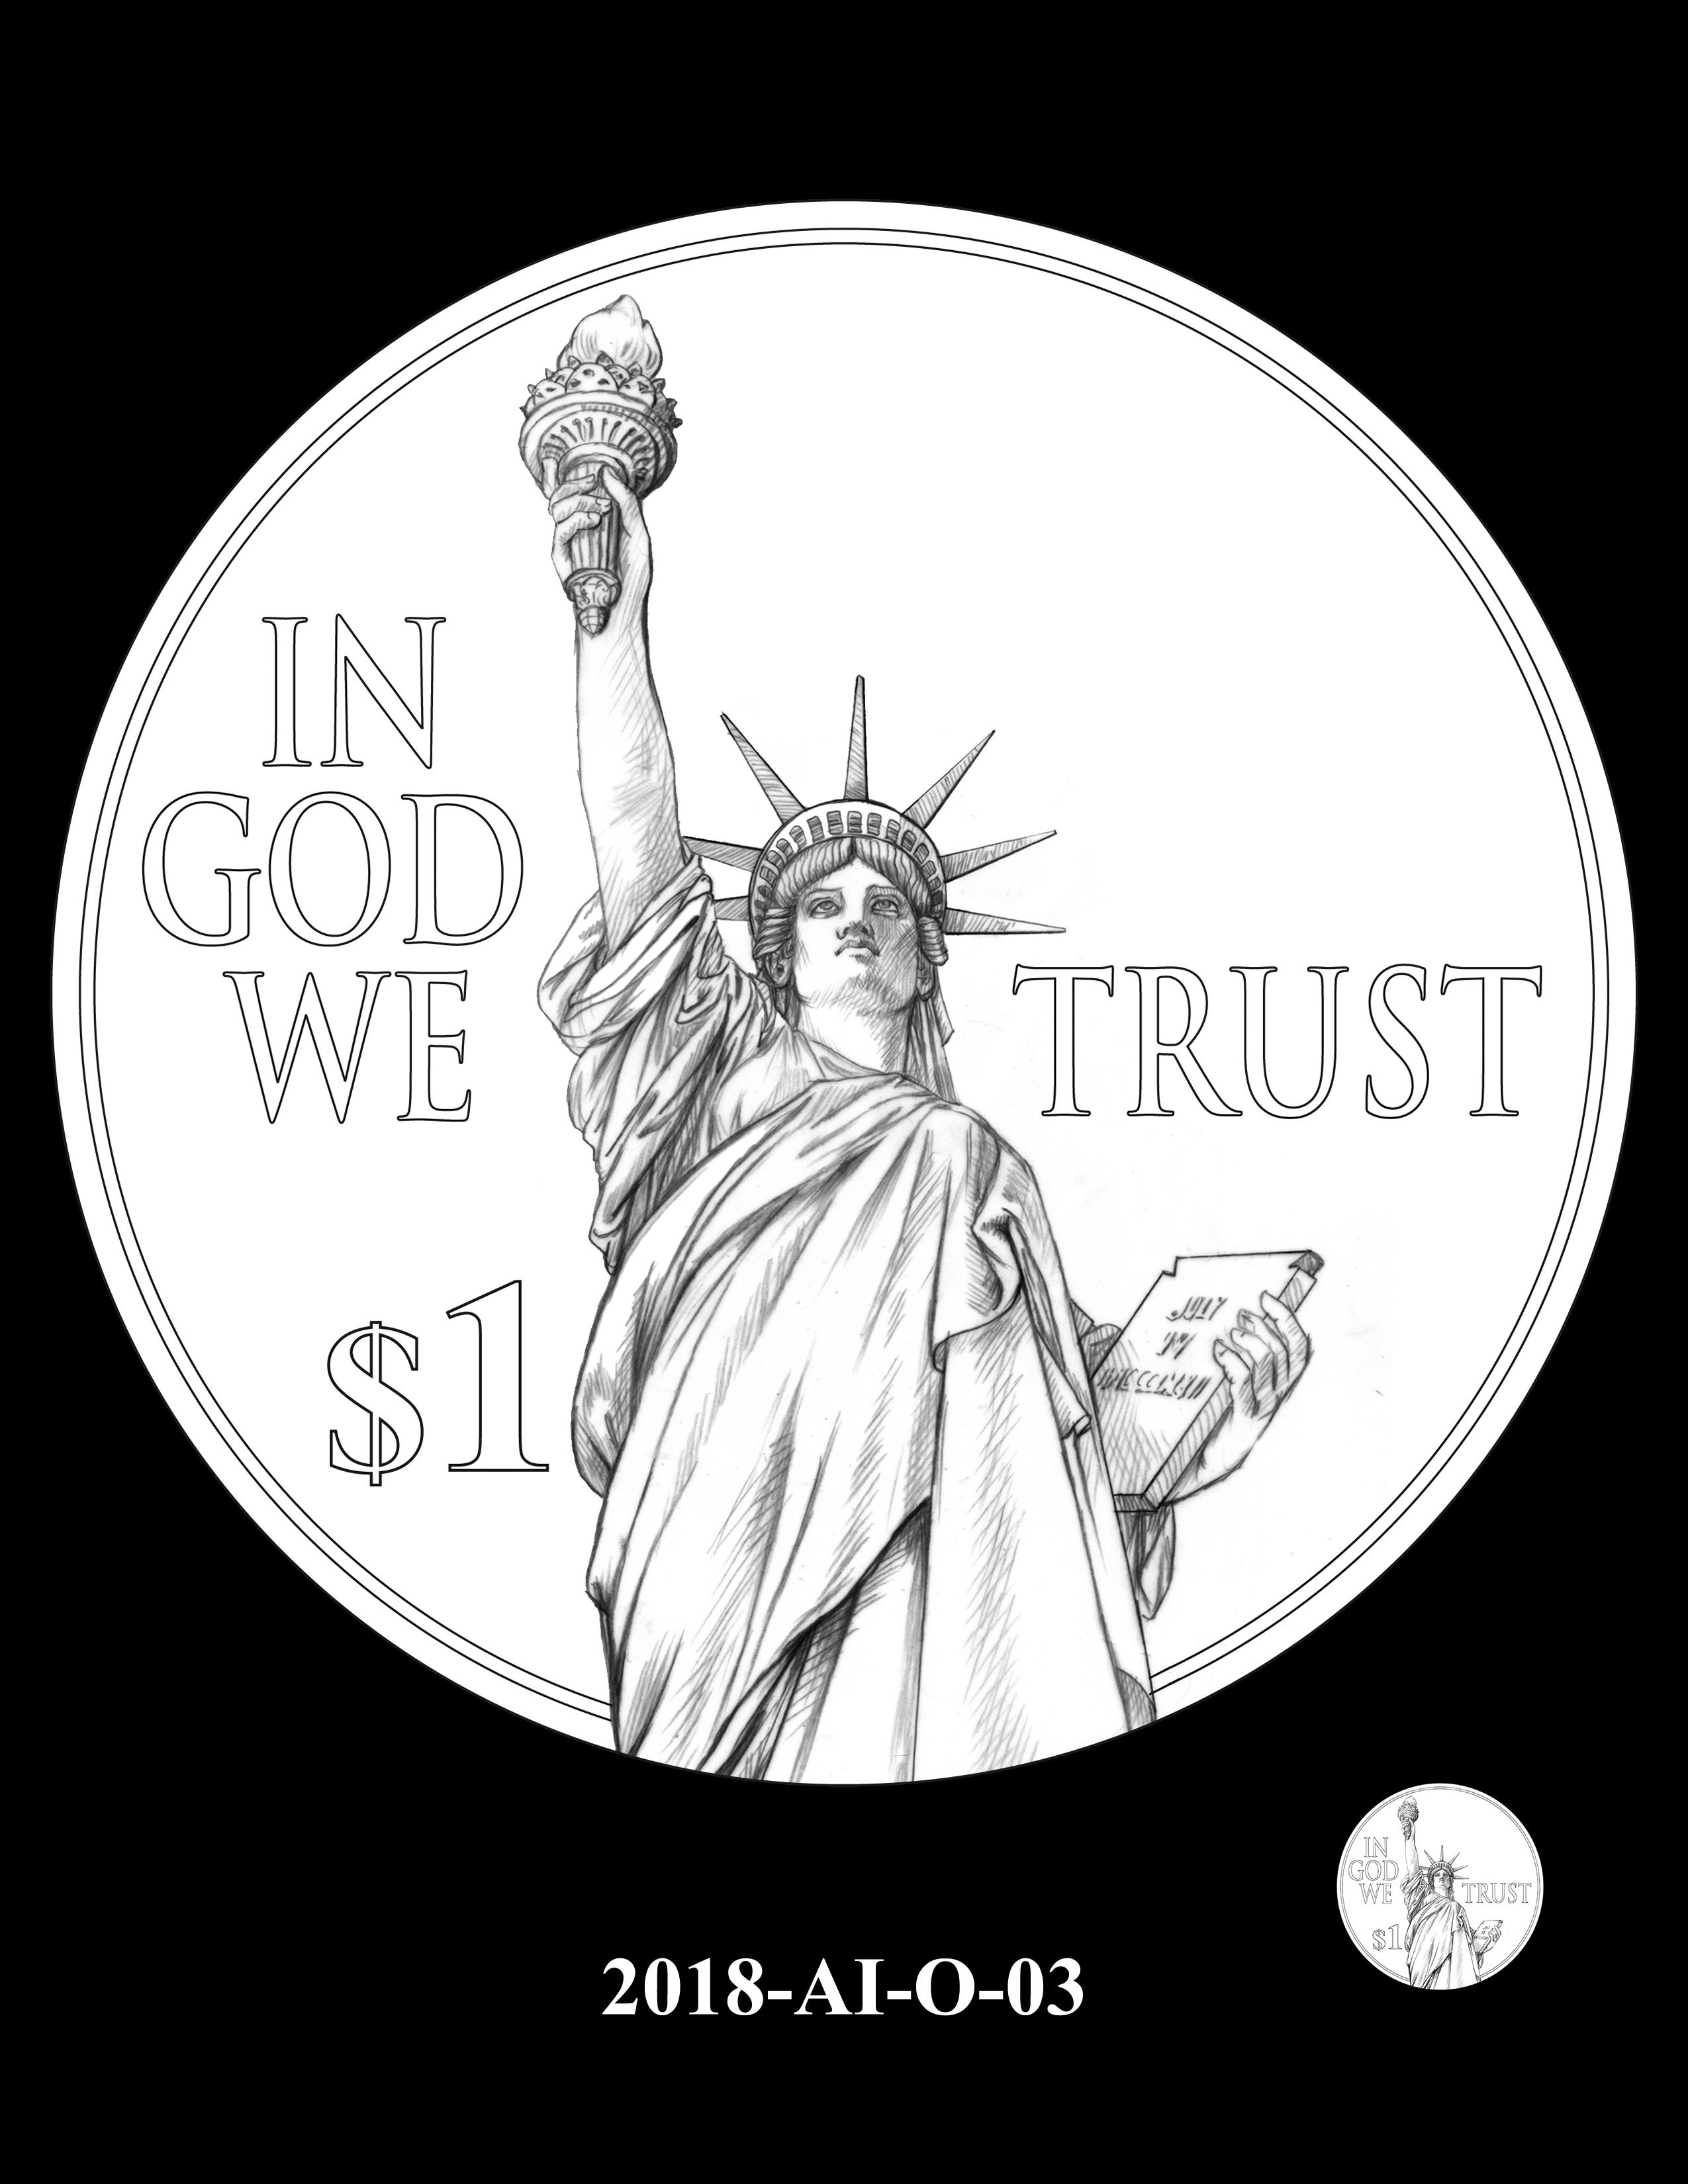 2018-AI-O-03 -- 2018 American Innovation $1 Coin